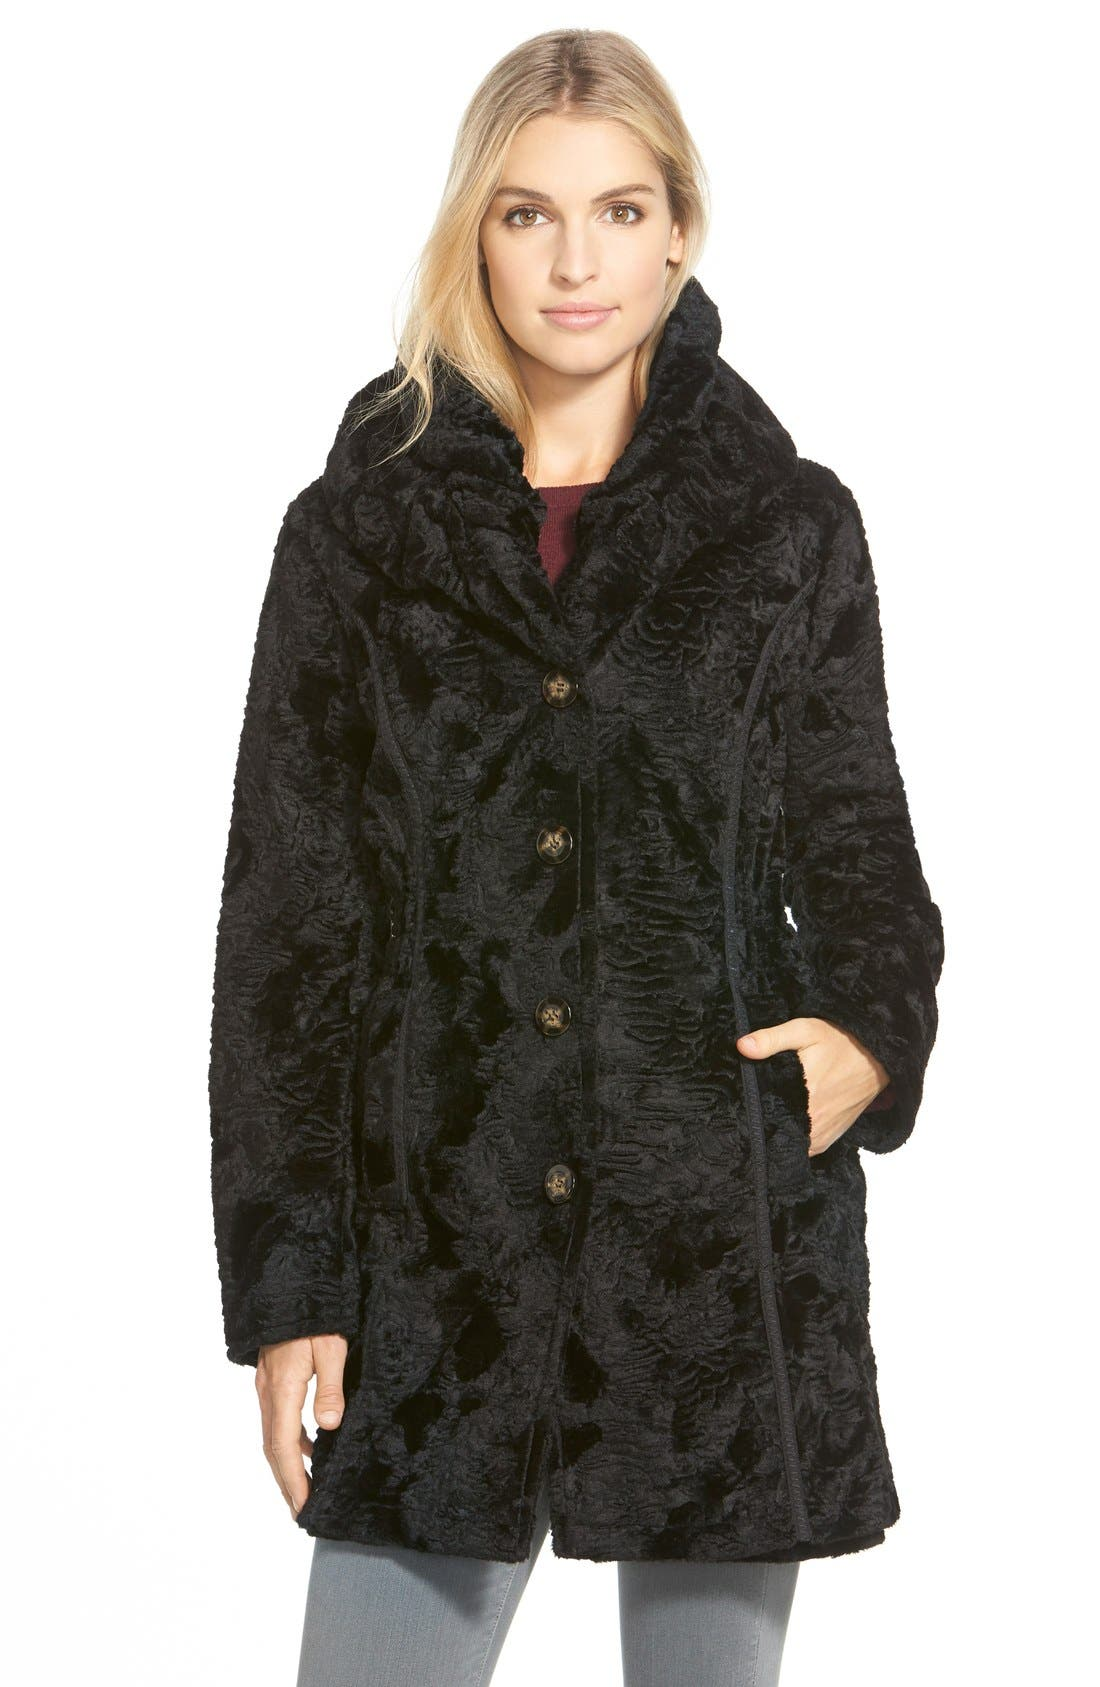 Laundry by ShelliSegalReversible FauxPersian Lamb Fur Coat,                         Main,                         color, 001